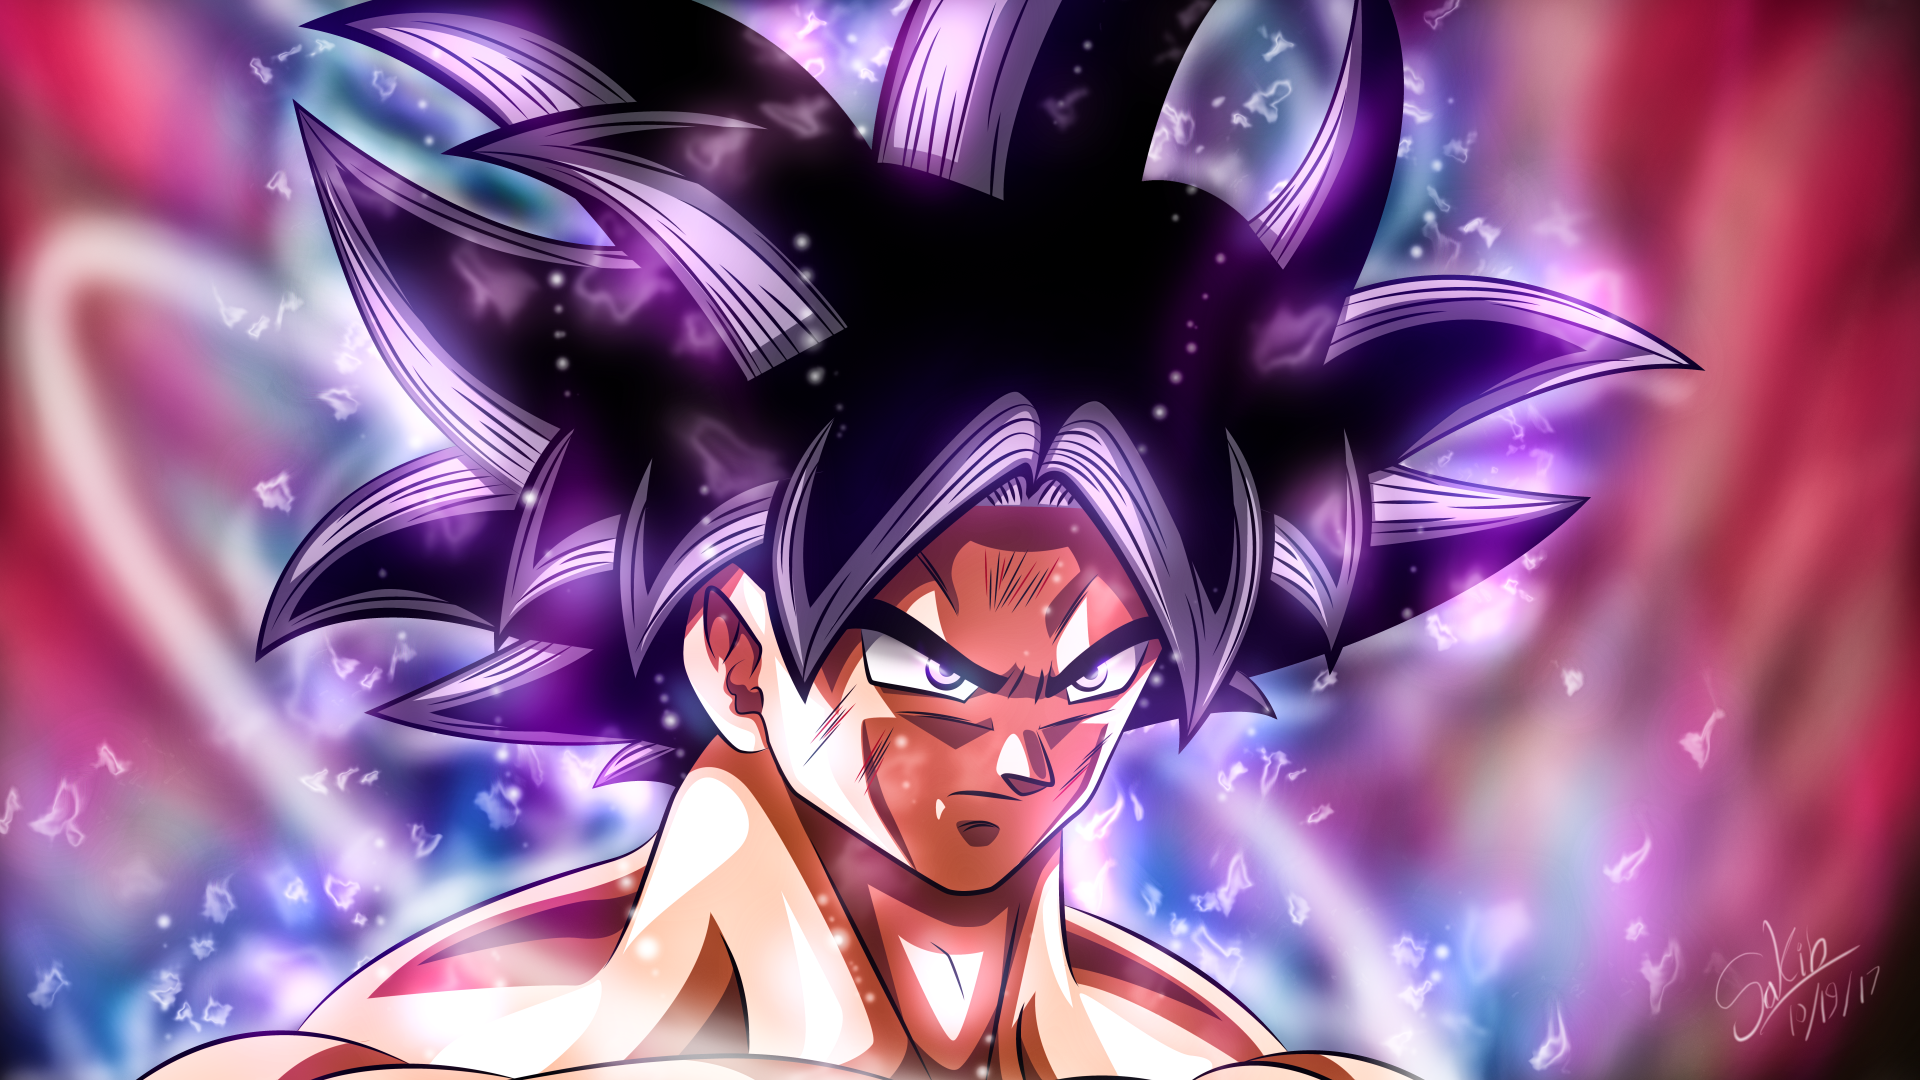 Dragon Ball Super 8k Ultra HD Wallpaper | Background Image ...